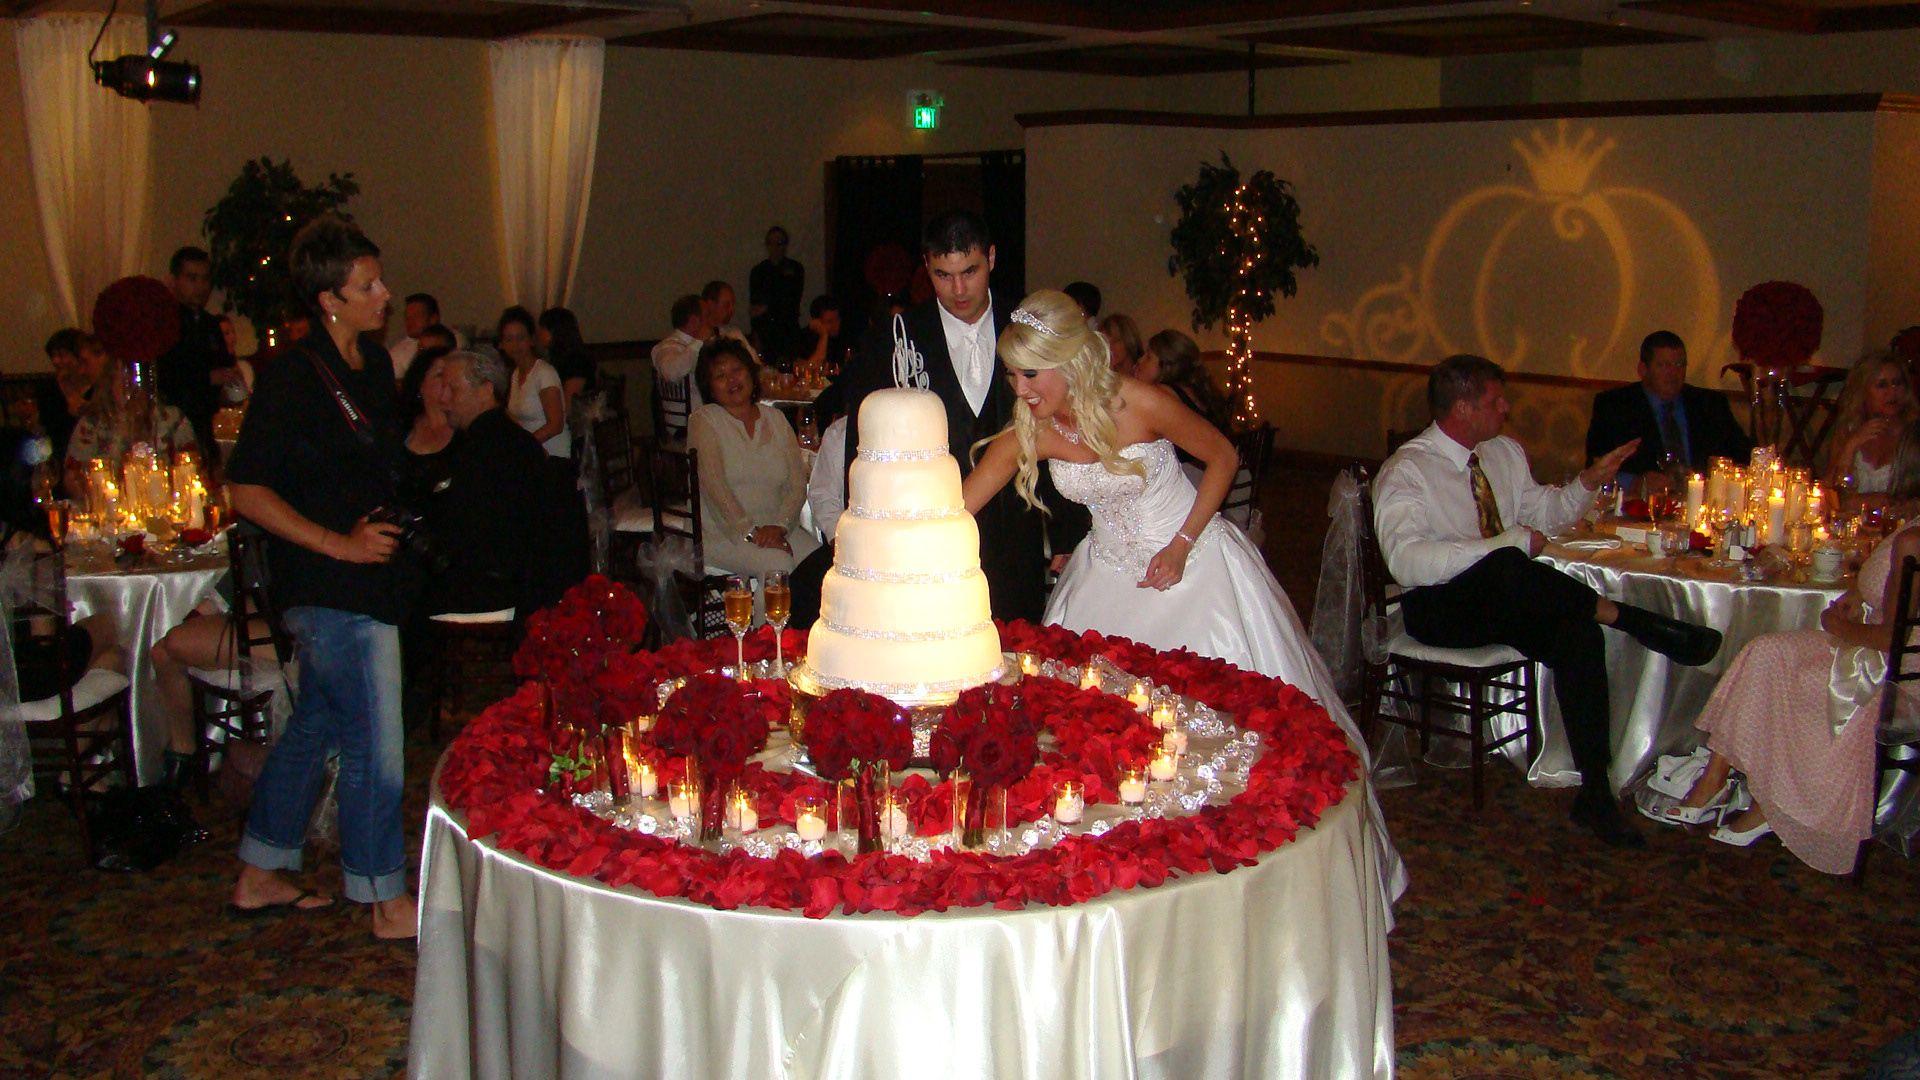 My Wedding Cake Table Red/Gold/Ivory/Wedding | Wedding cakes, Art ...